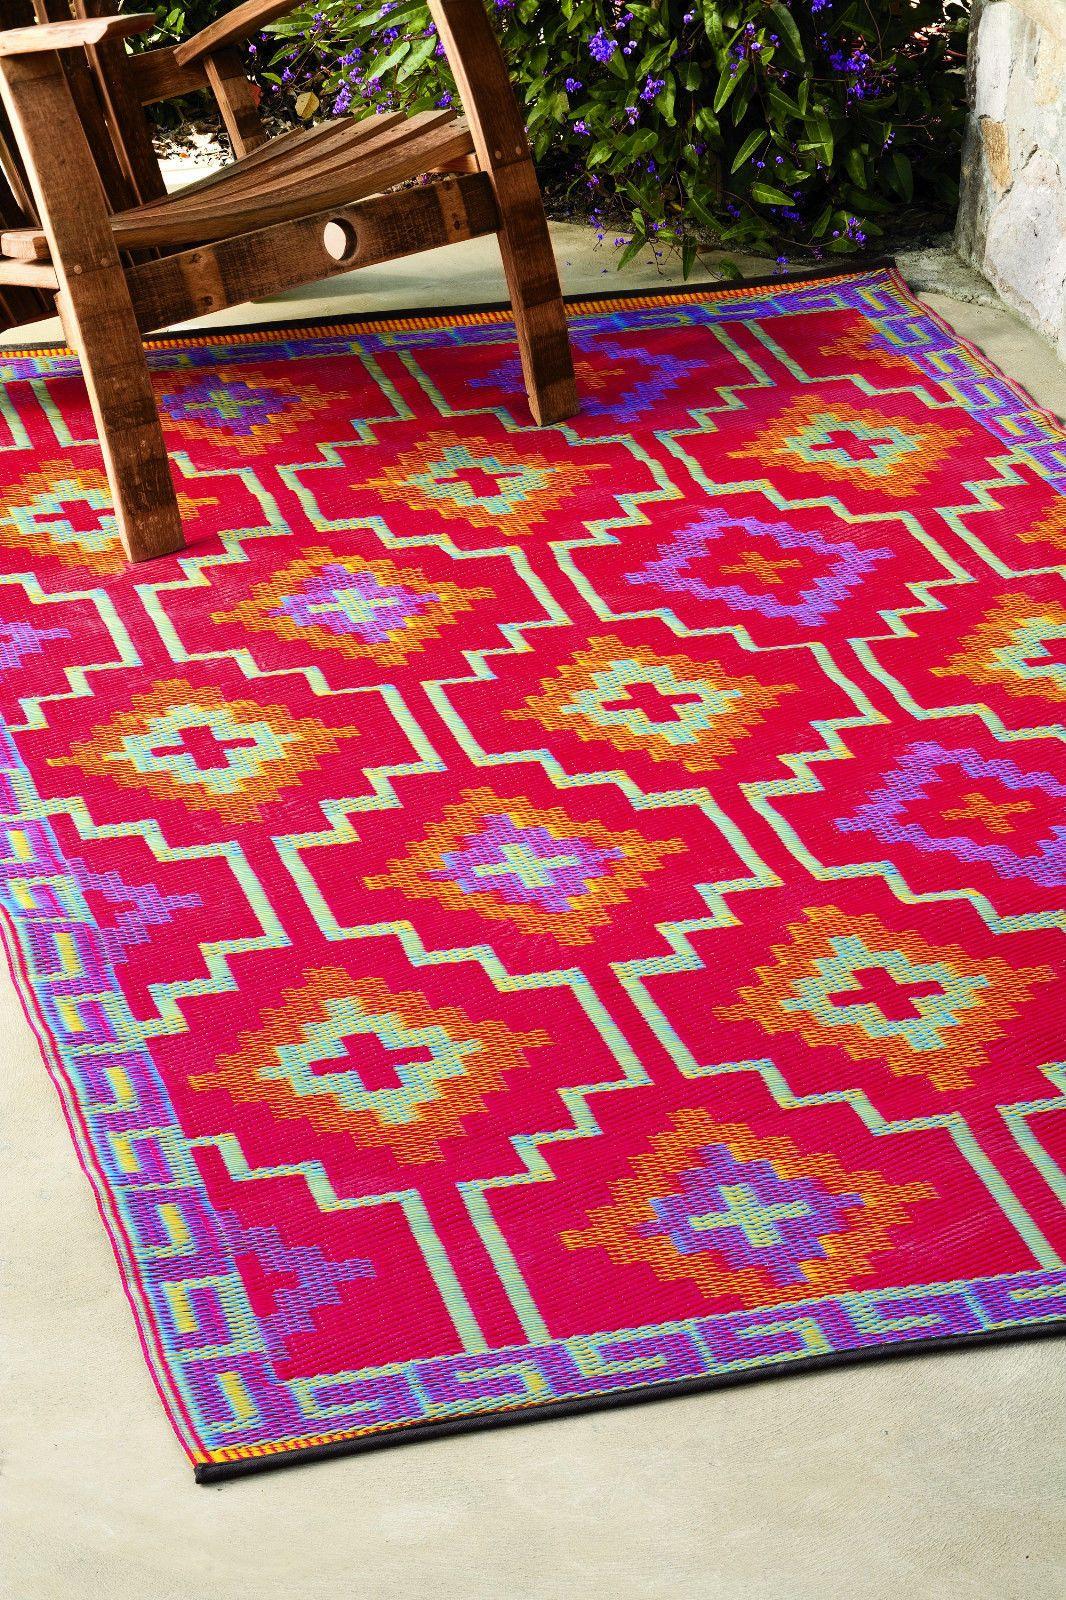 Fab Habitat Indoor Outdoor Patio Rug Mat Lhasa Orange Purple Choose Size |  EBay